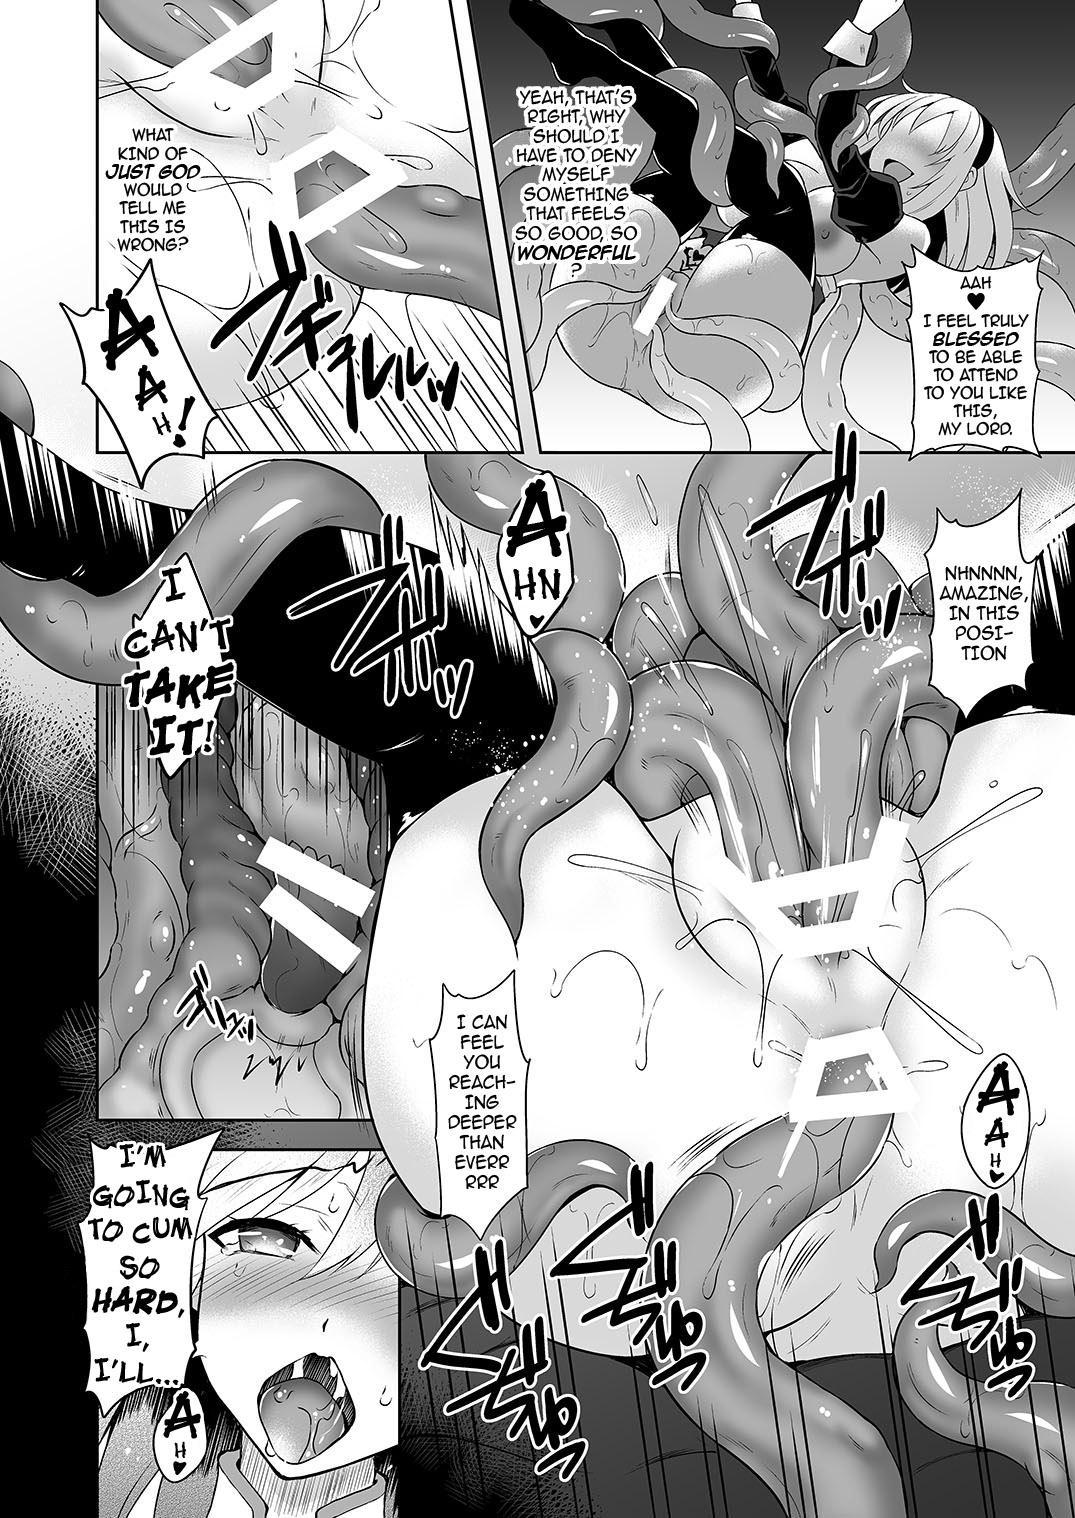 [Chococornet (Tenro Aya)] Falling - Mashoku no Sennou Dorei   Falling - Brainwashed Slave of the Great Wurm [English] {darknight} [Digital] 18